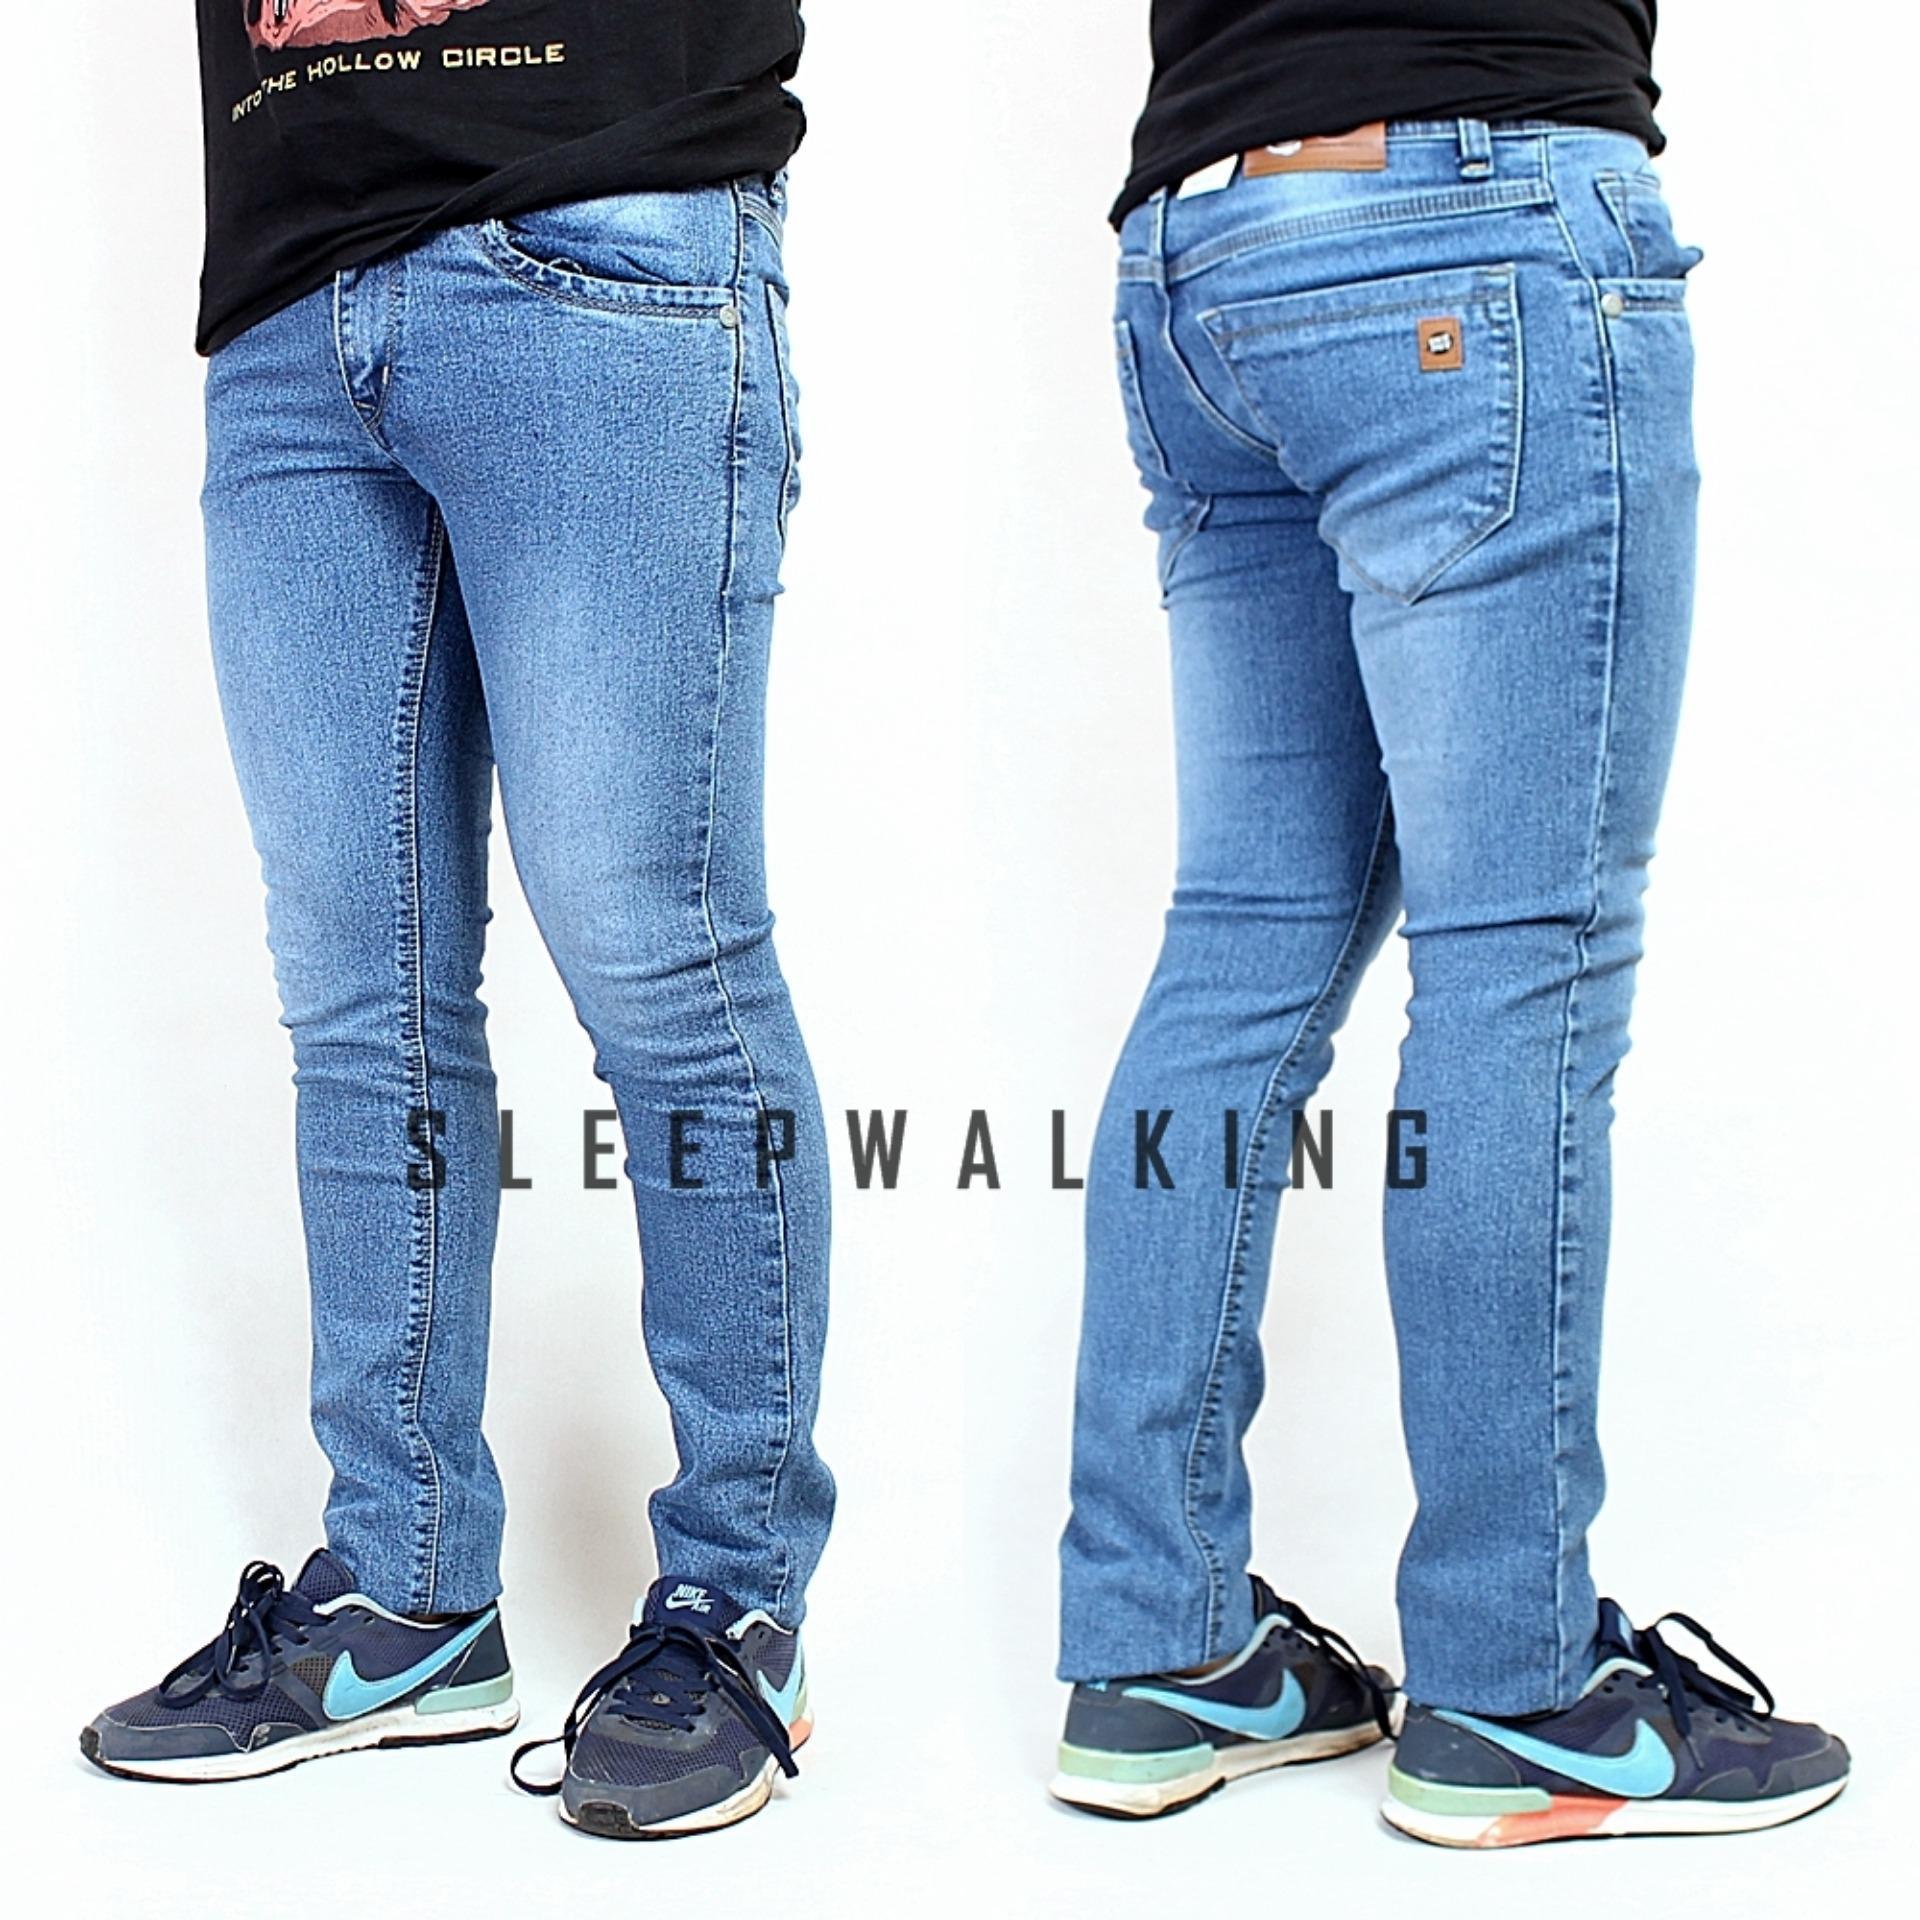 Beli Sw Celana Jeans Pria Slimfit Bioblitz Di Jawa Barat